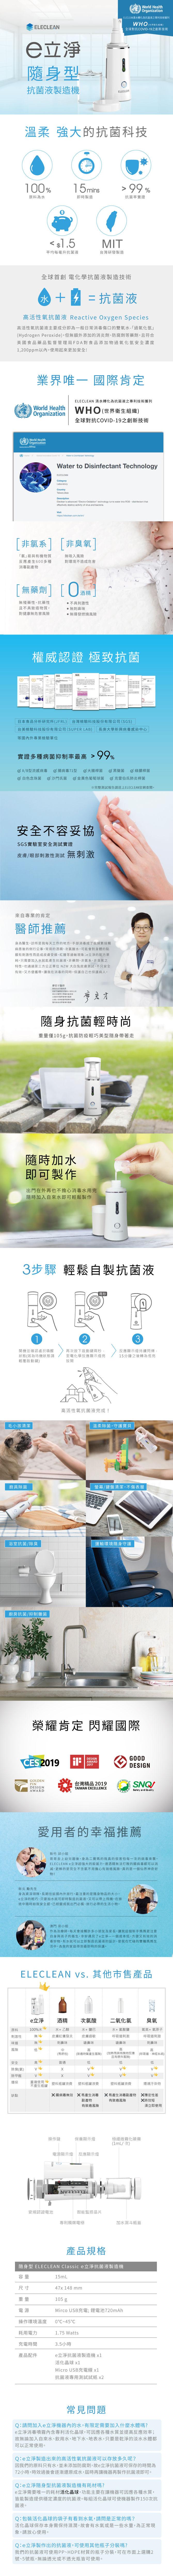 ELECLEAN|隨身型e立淨消毒噴霧製造機(兩色任選)